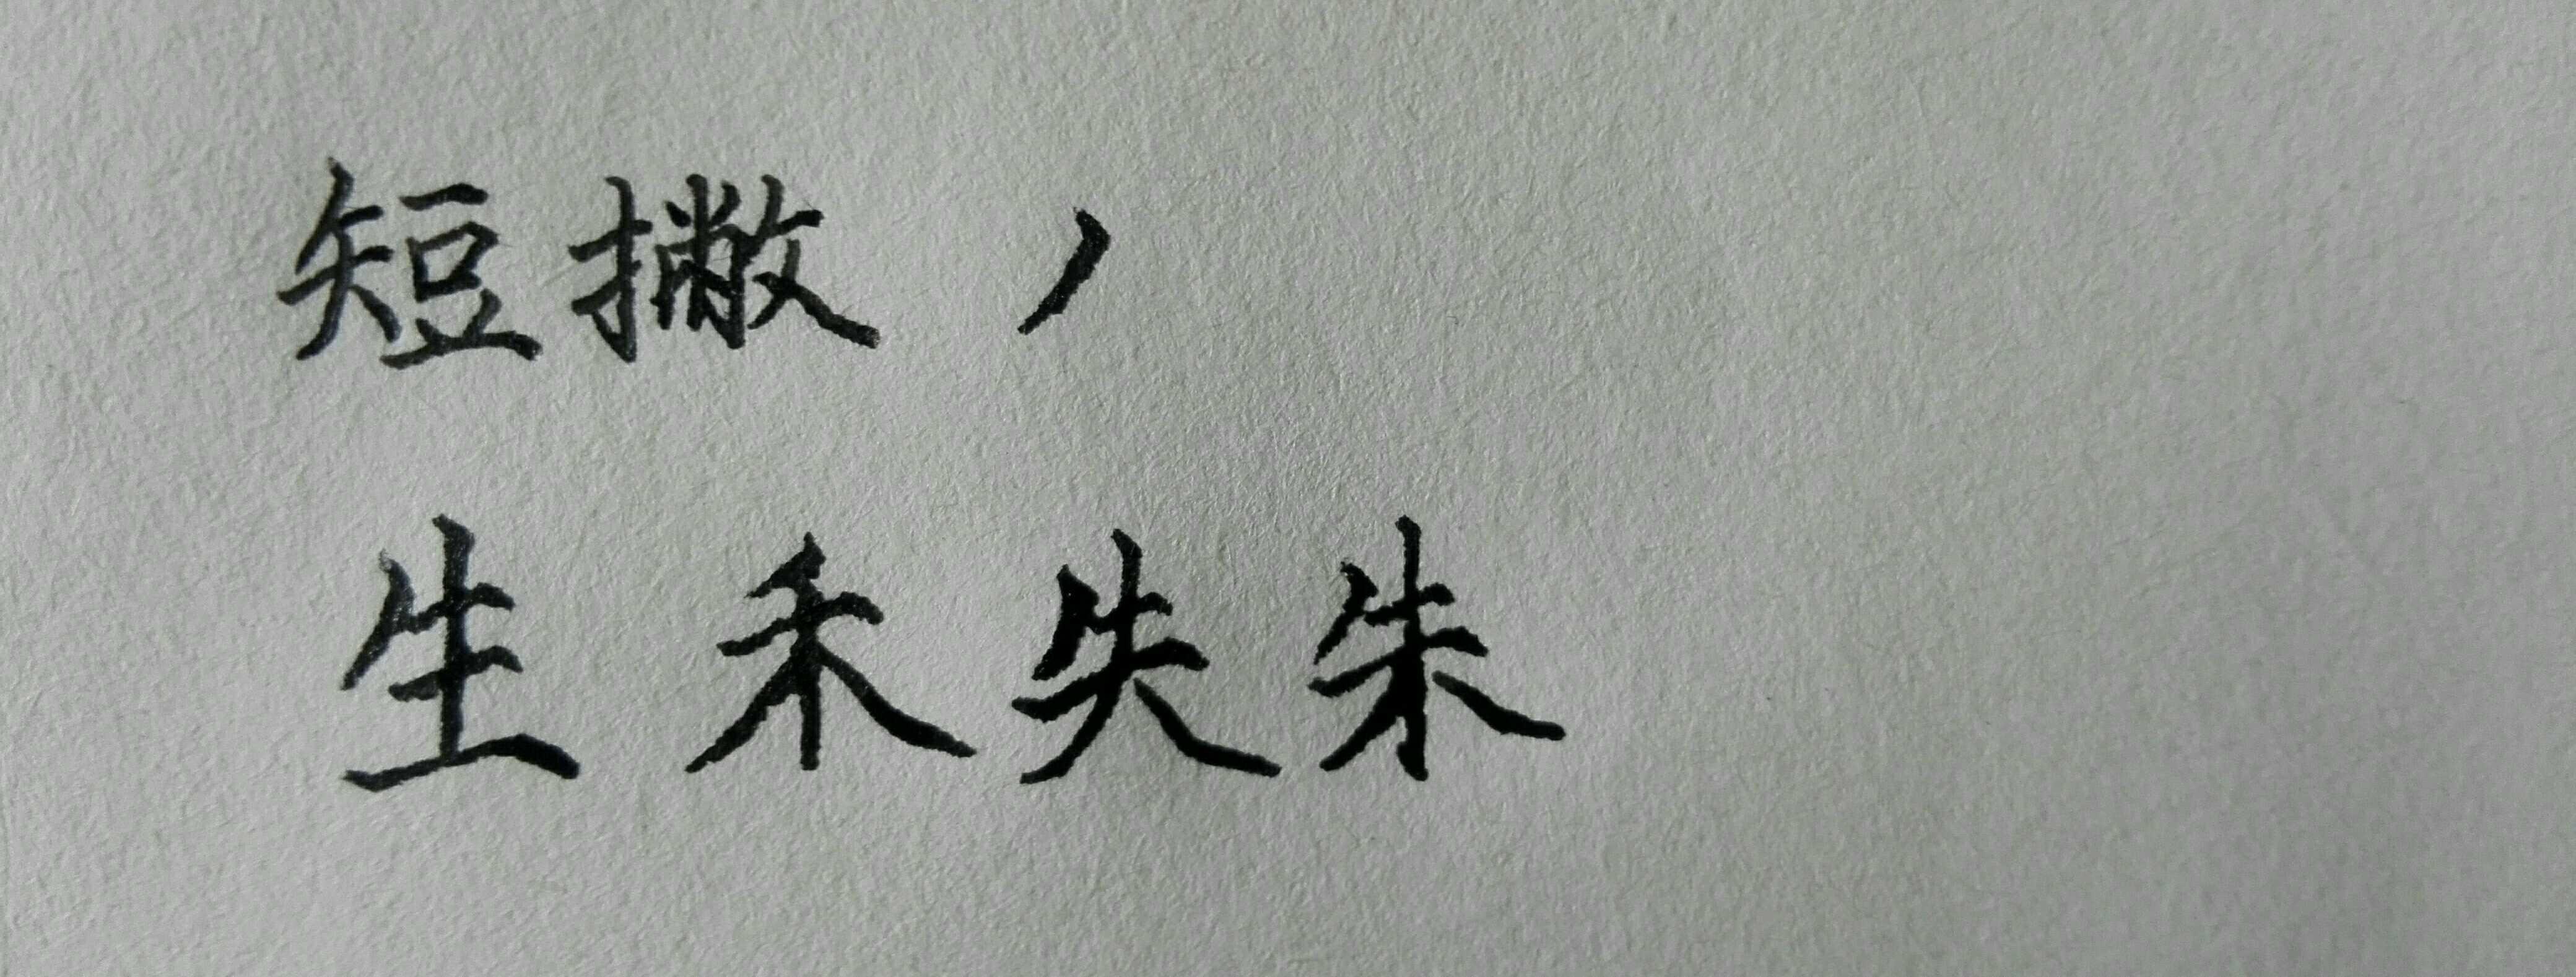 IMG_20180212_142018.jpg